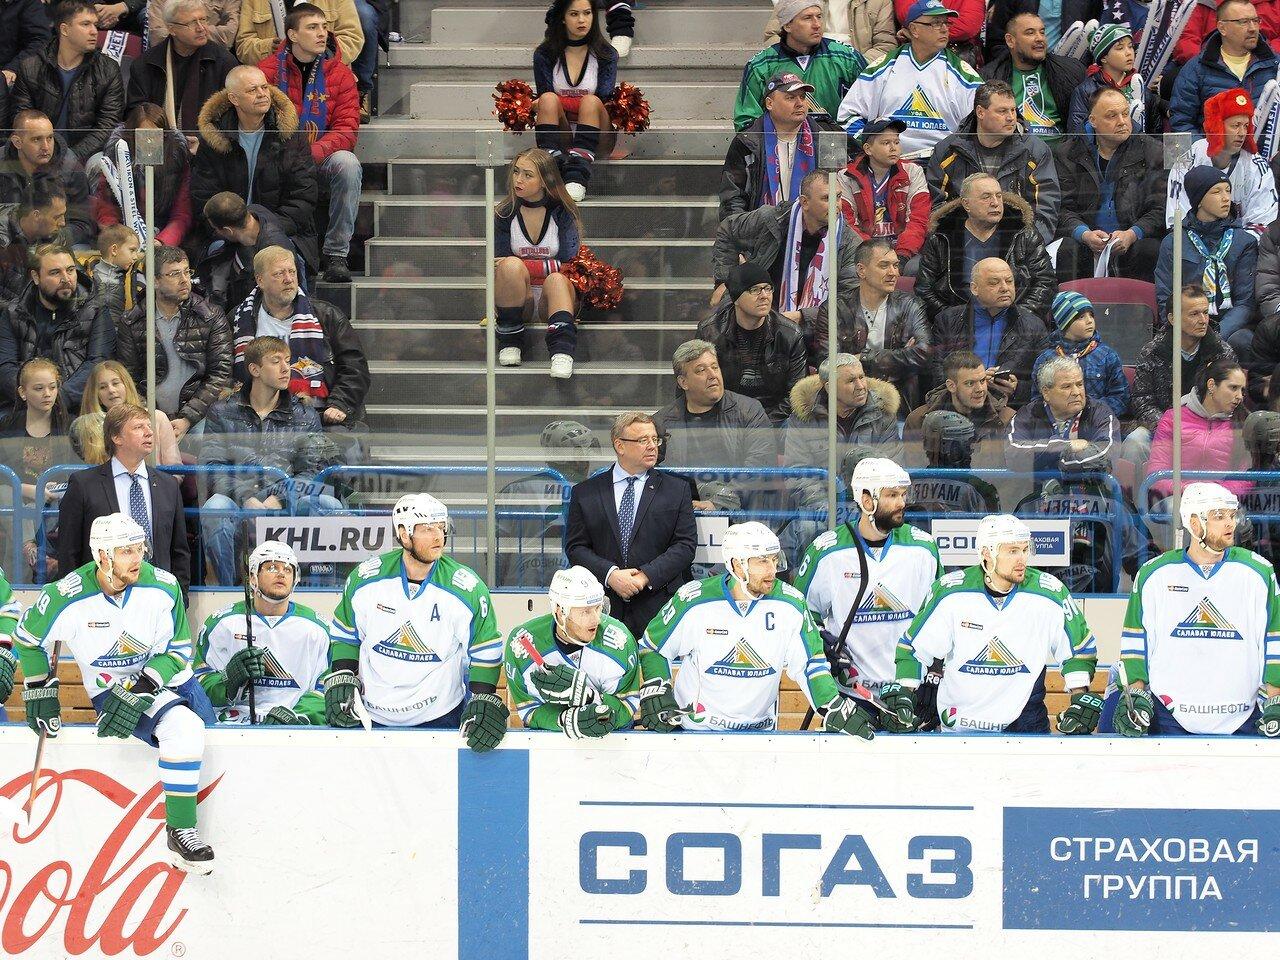 6Плей-офф 2016 Восток Финал Металлург - Салават Юлаев 25.03.2016